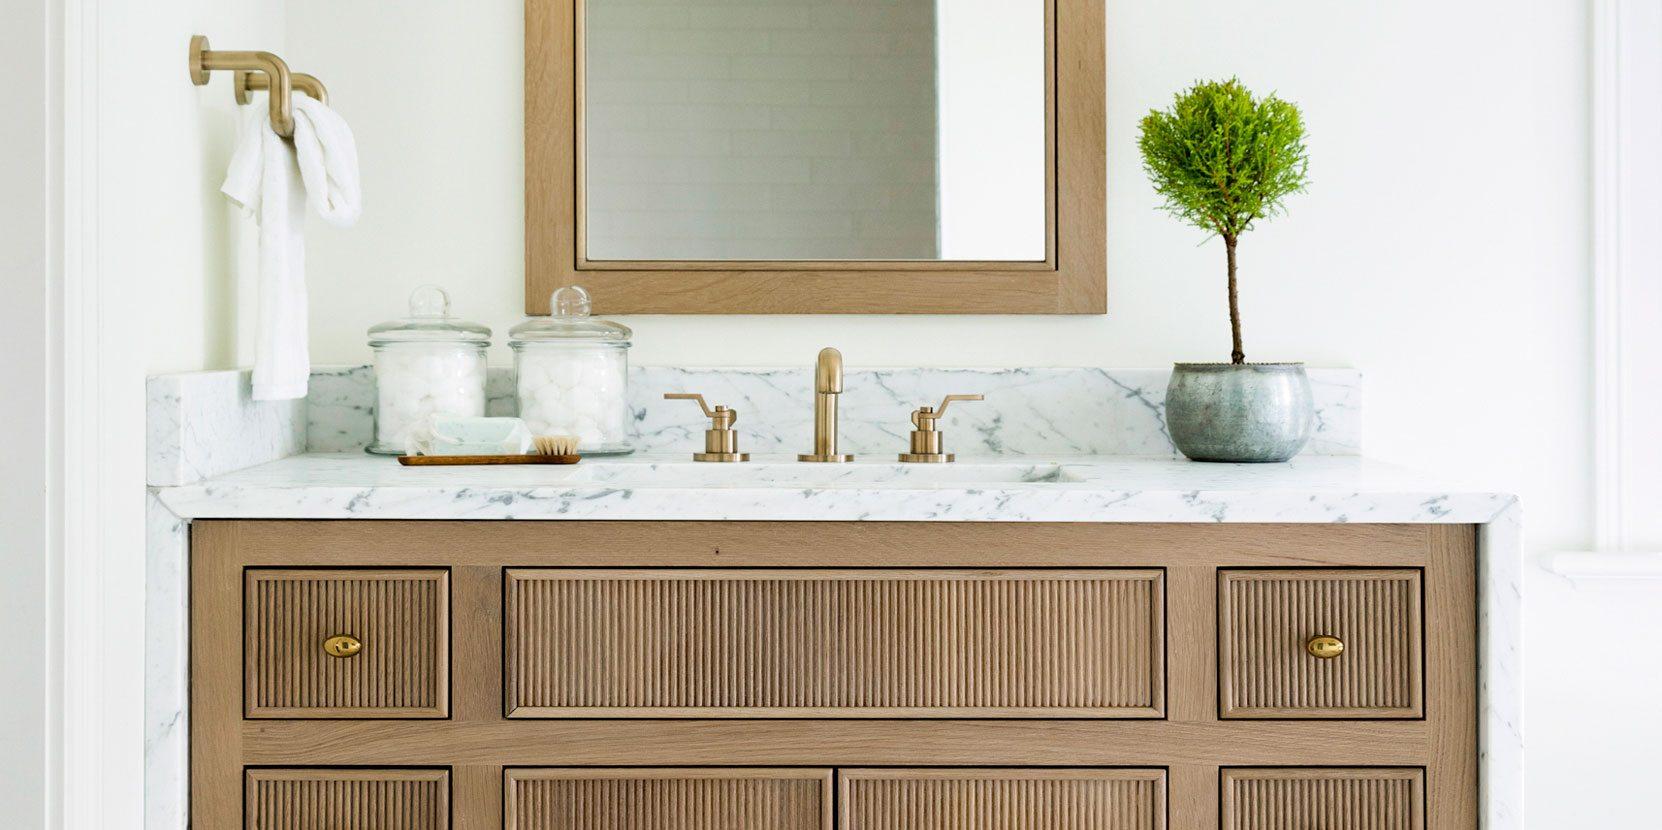 Bathroom Vanity Details | Bria Hammel Interiors